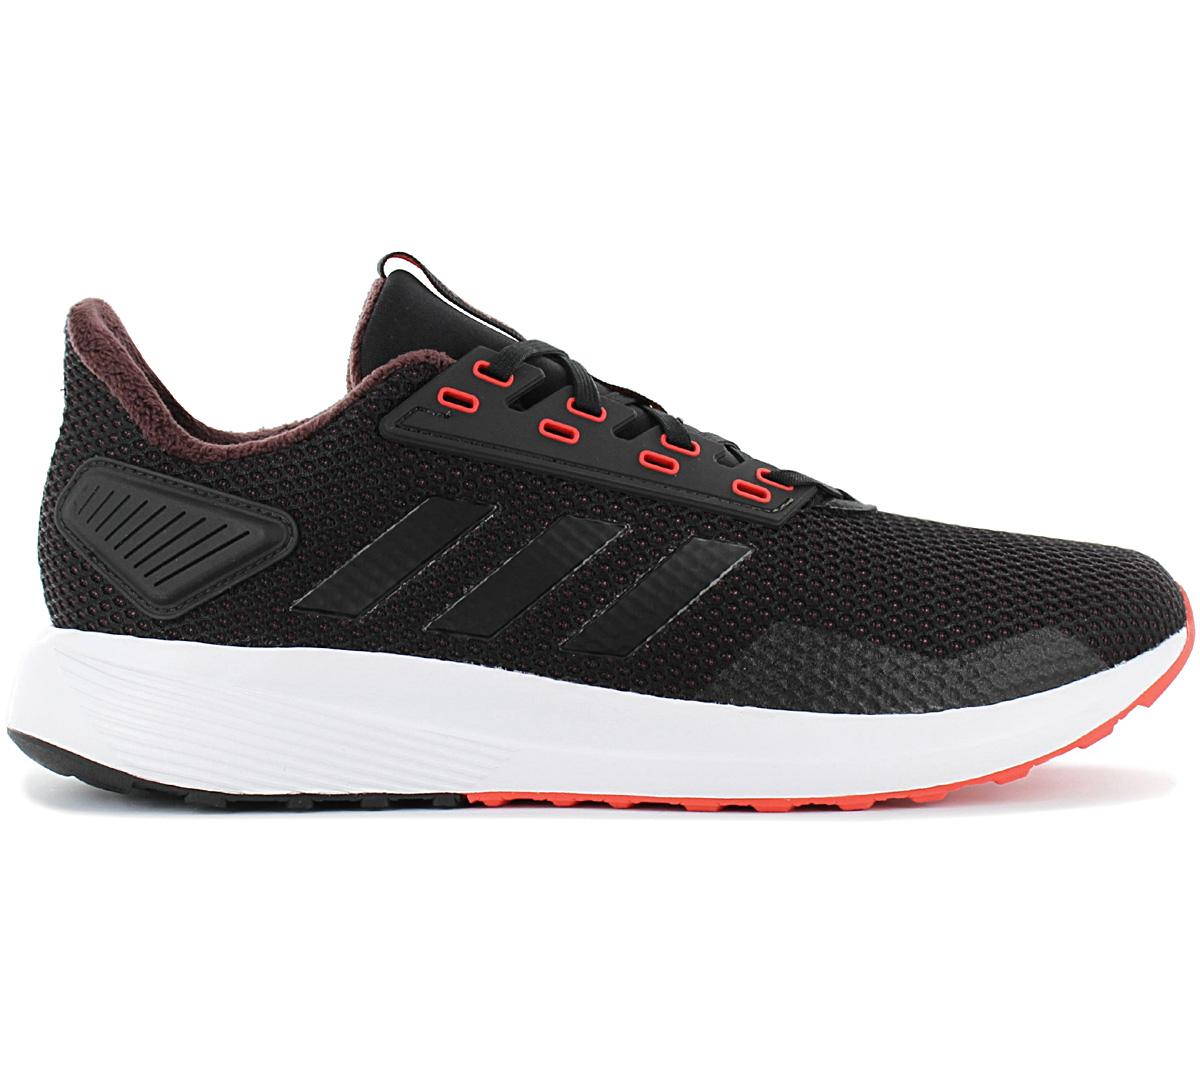 Details zu adidas Duramo 9 Herren Schuhe BB7646 Schwarz Laufschuhe Sportschuhe Running NEU